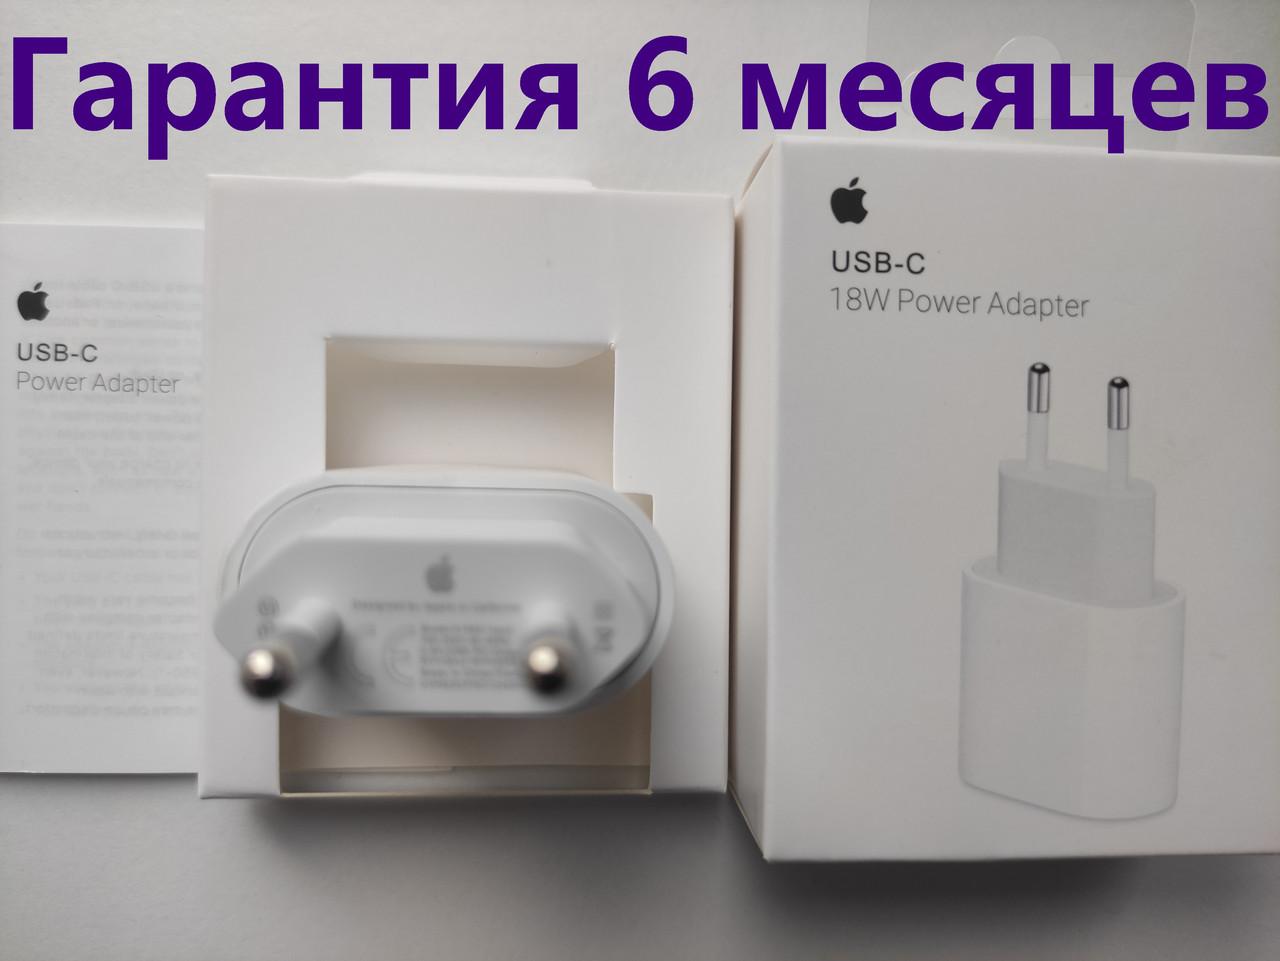 Сетевое зарядное устройство Apple 18W USB-C Power Adapter (MU7T2,MU7V2ZM/A) А1692 Зарядка для iPhone12 Pro Max